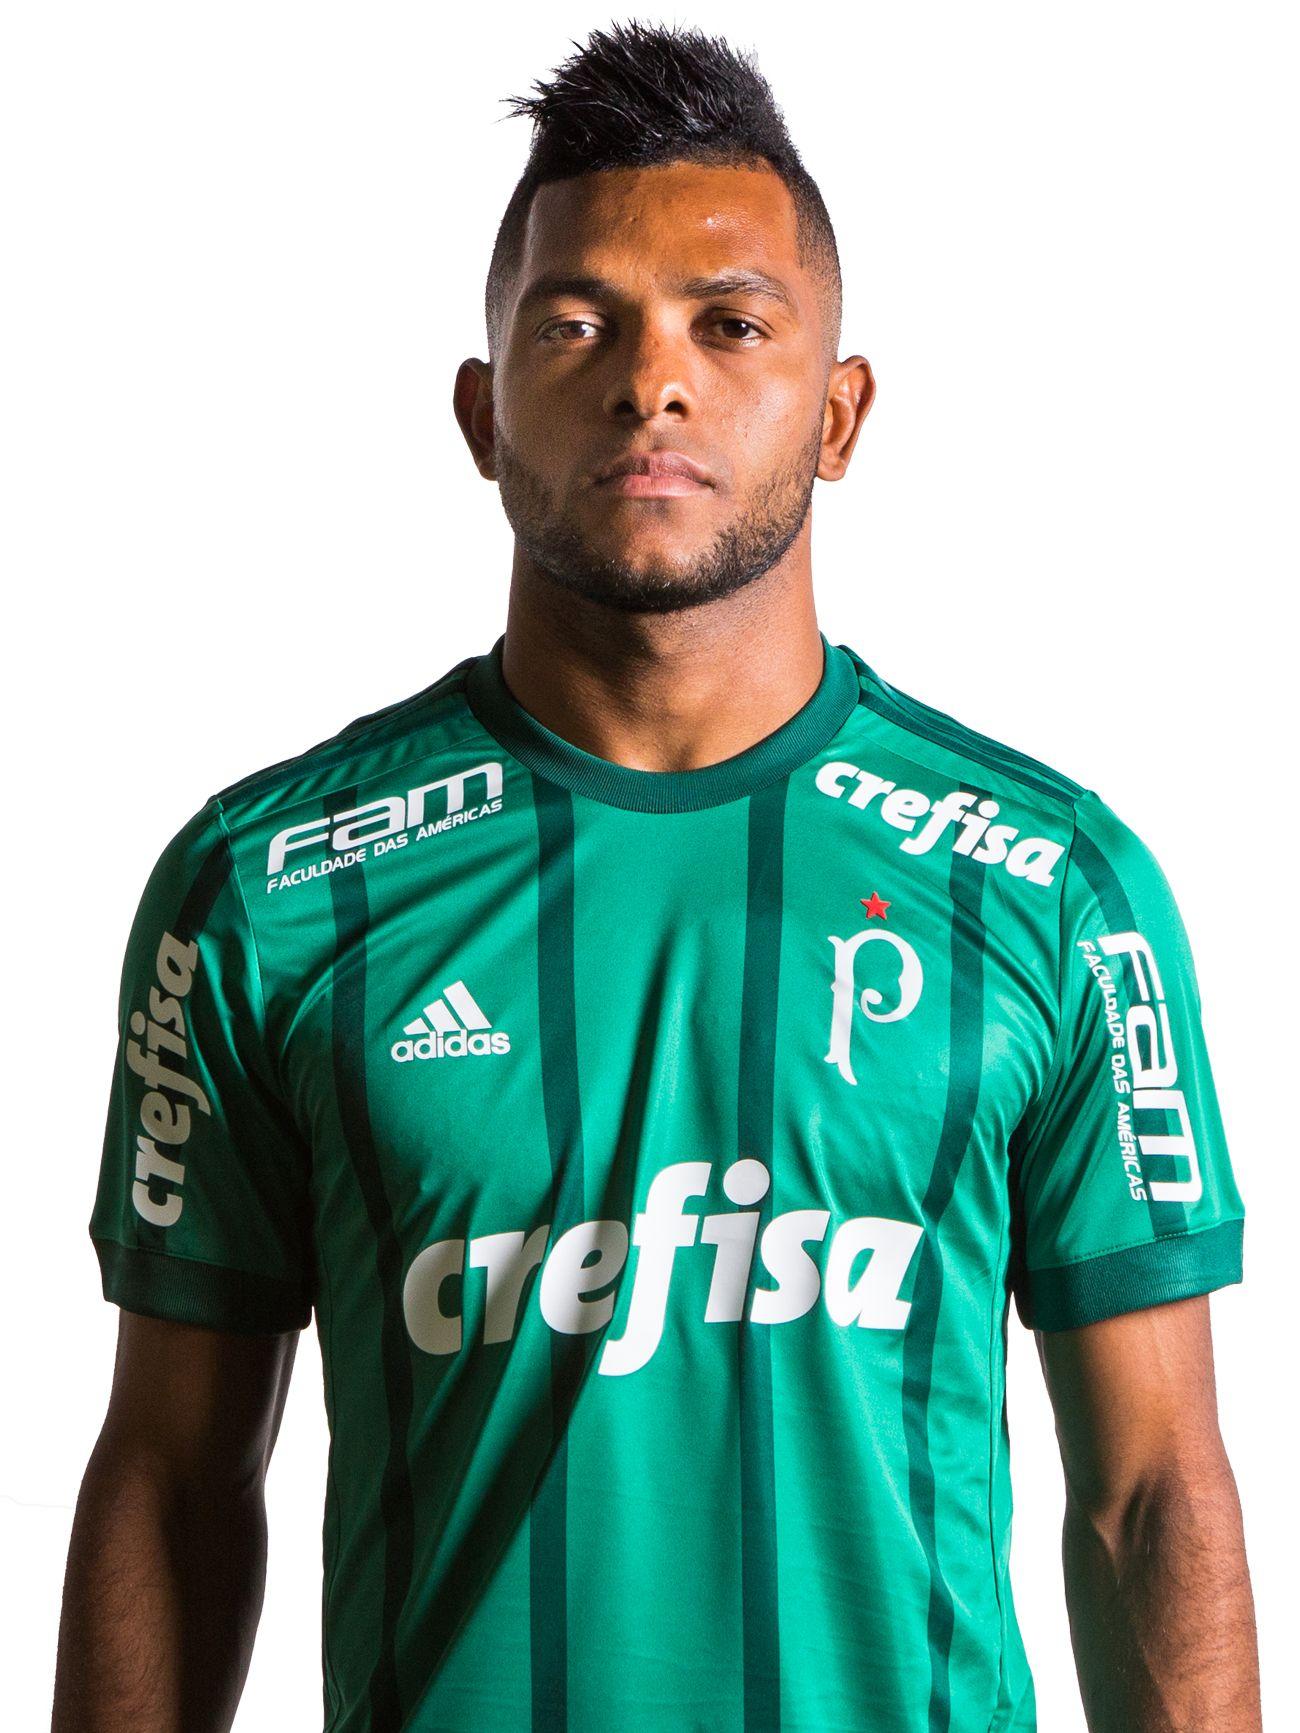 65c4f3249e5aa Miguel Ángel Borja Hernández